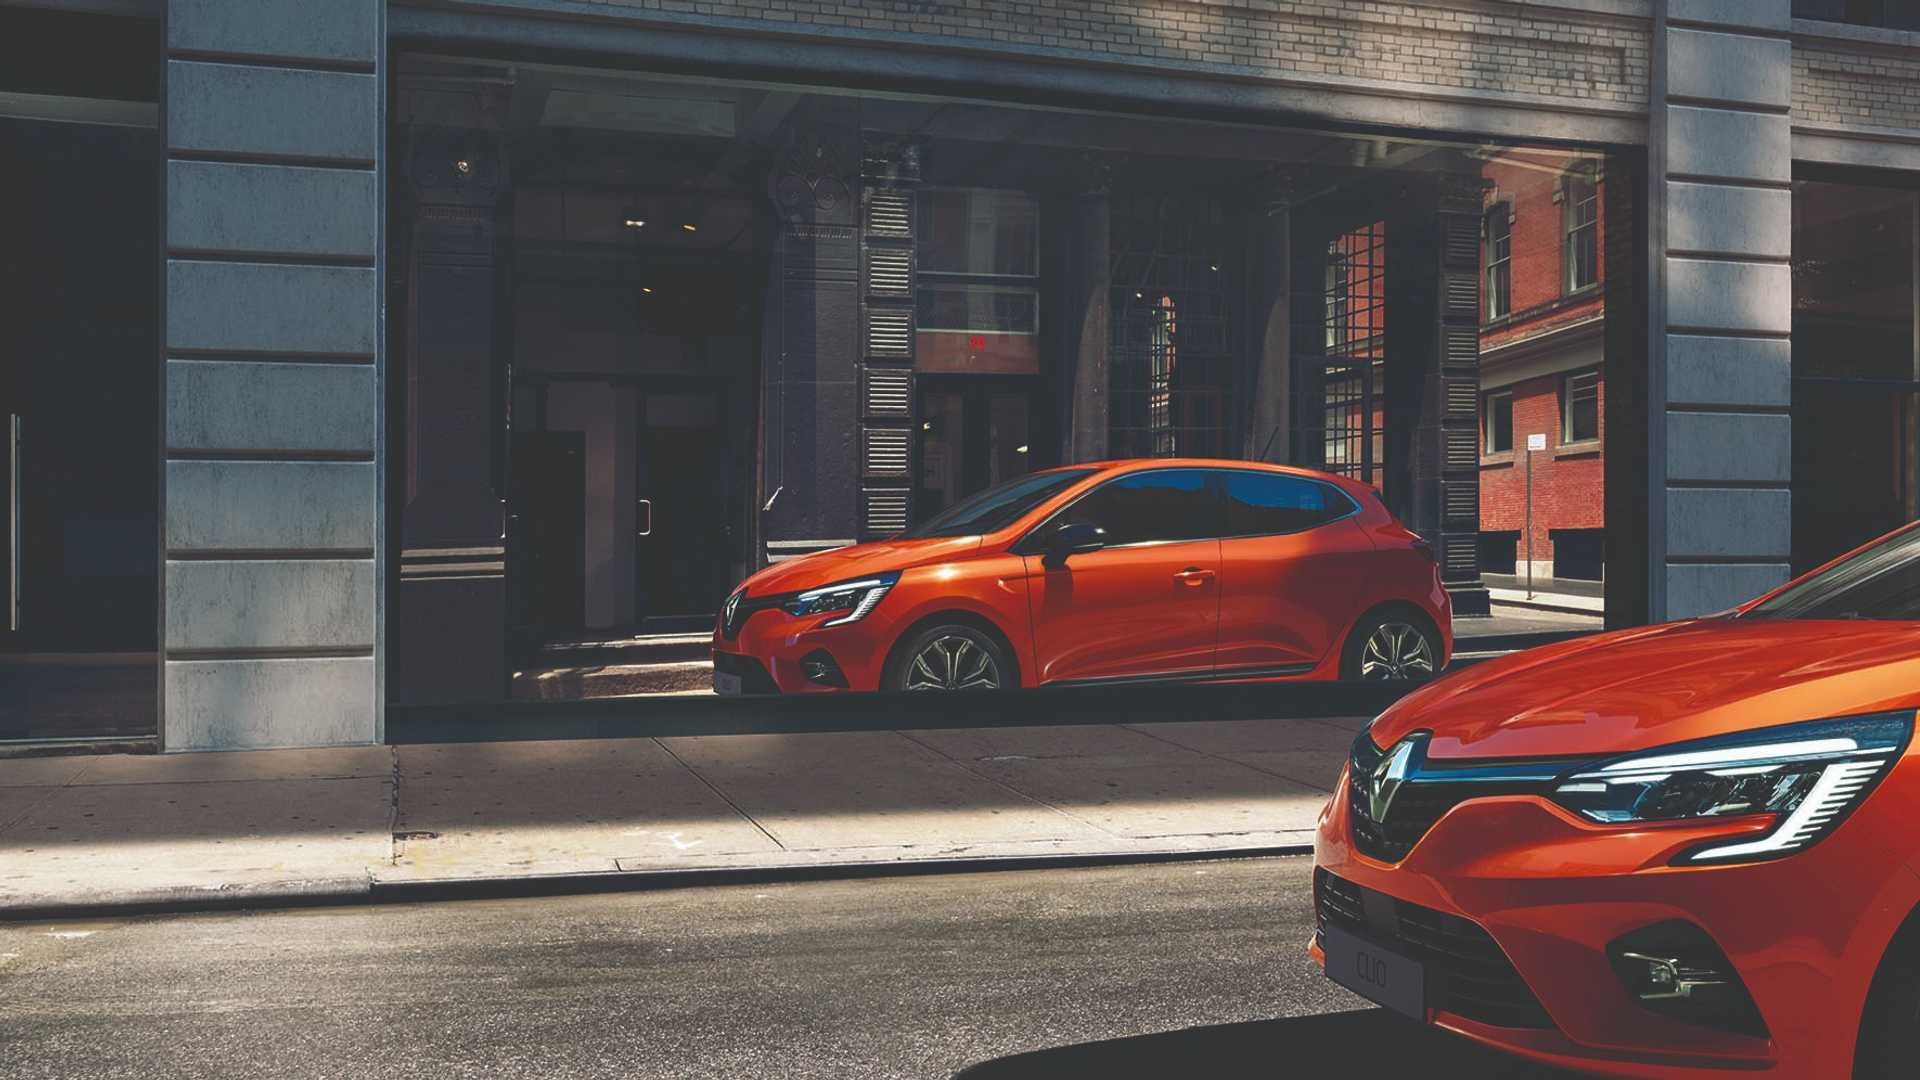 2019 Renault Clio V Revealed Ahead of Geneva Debut 5